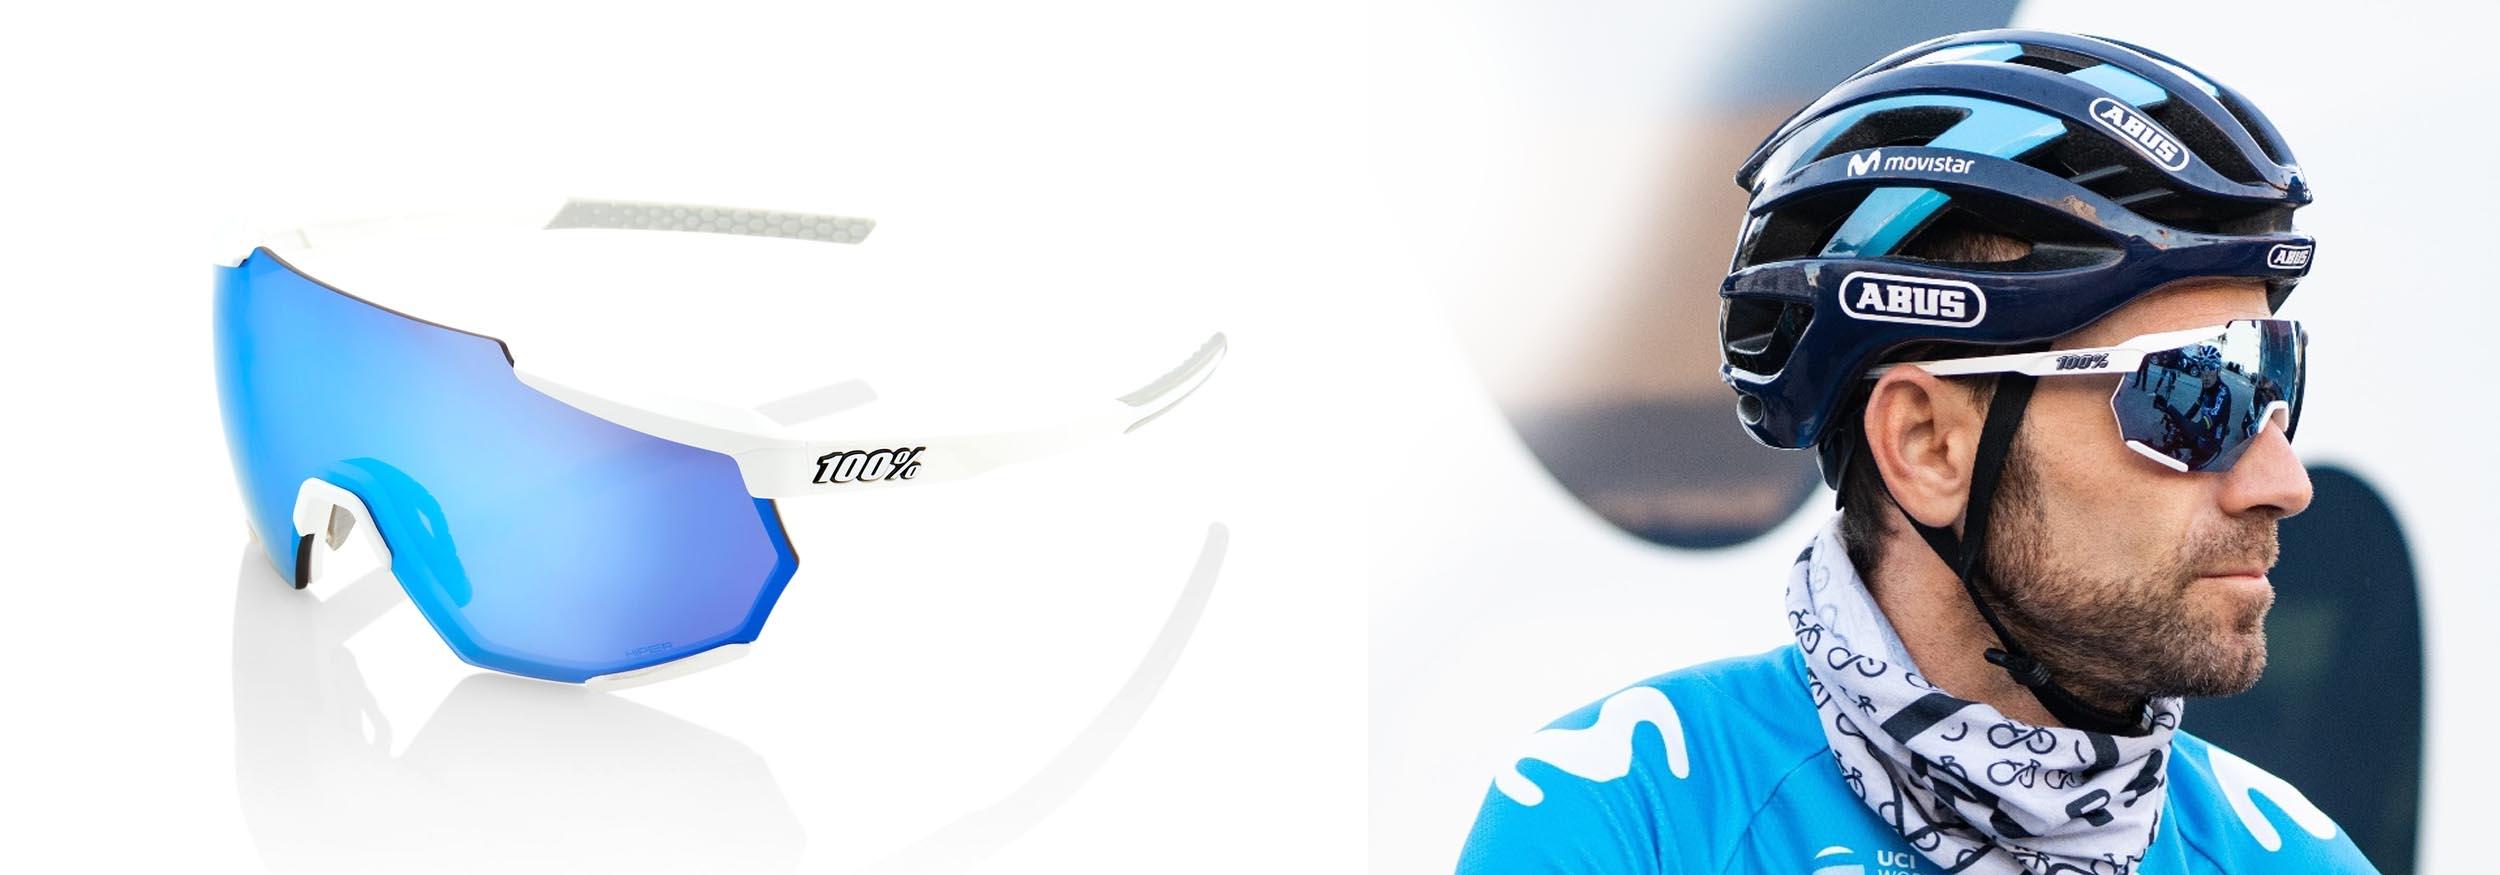 racetrap gafas ciclismo valverde movistar team